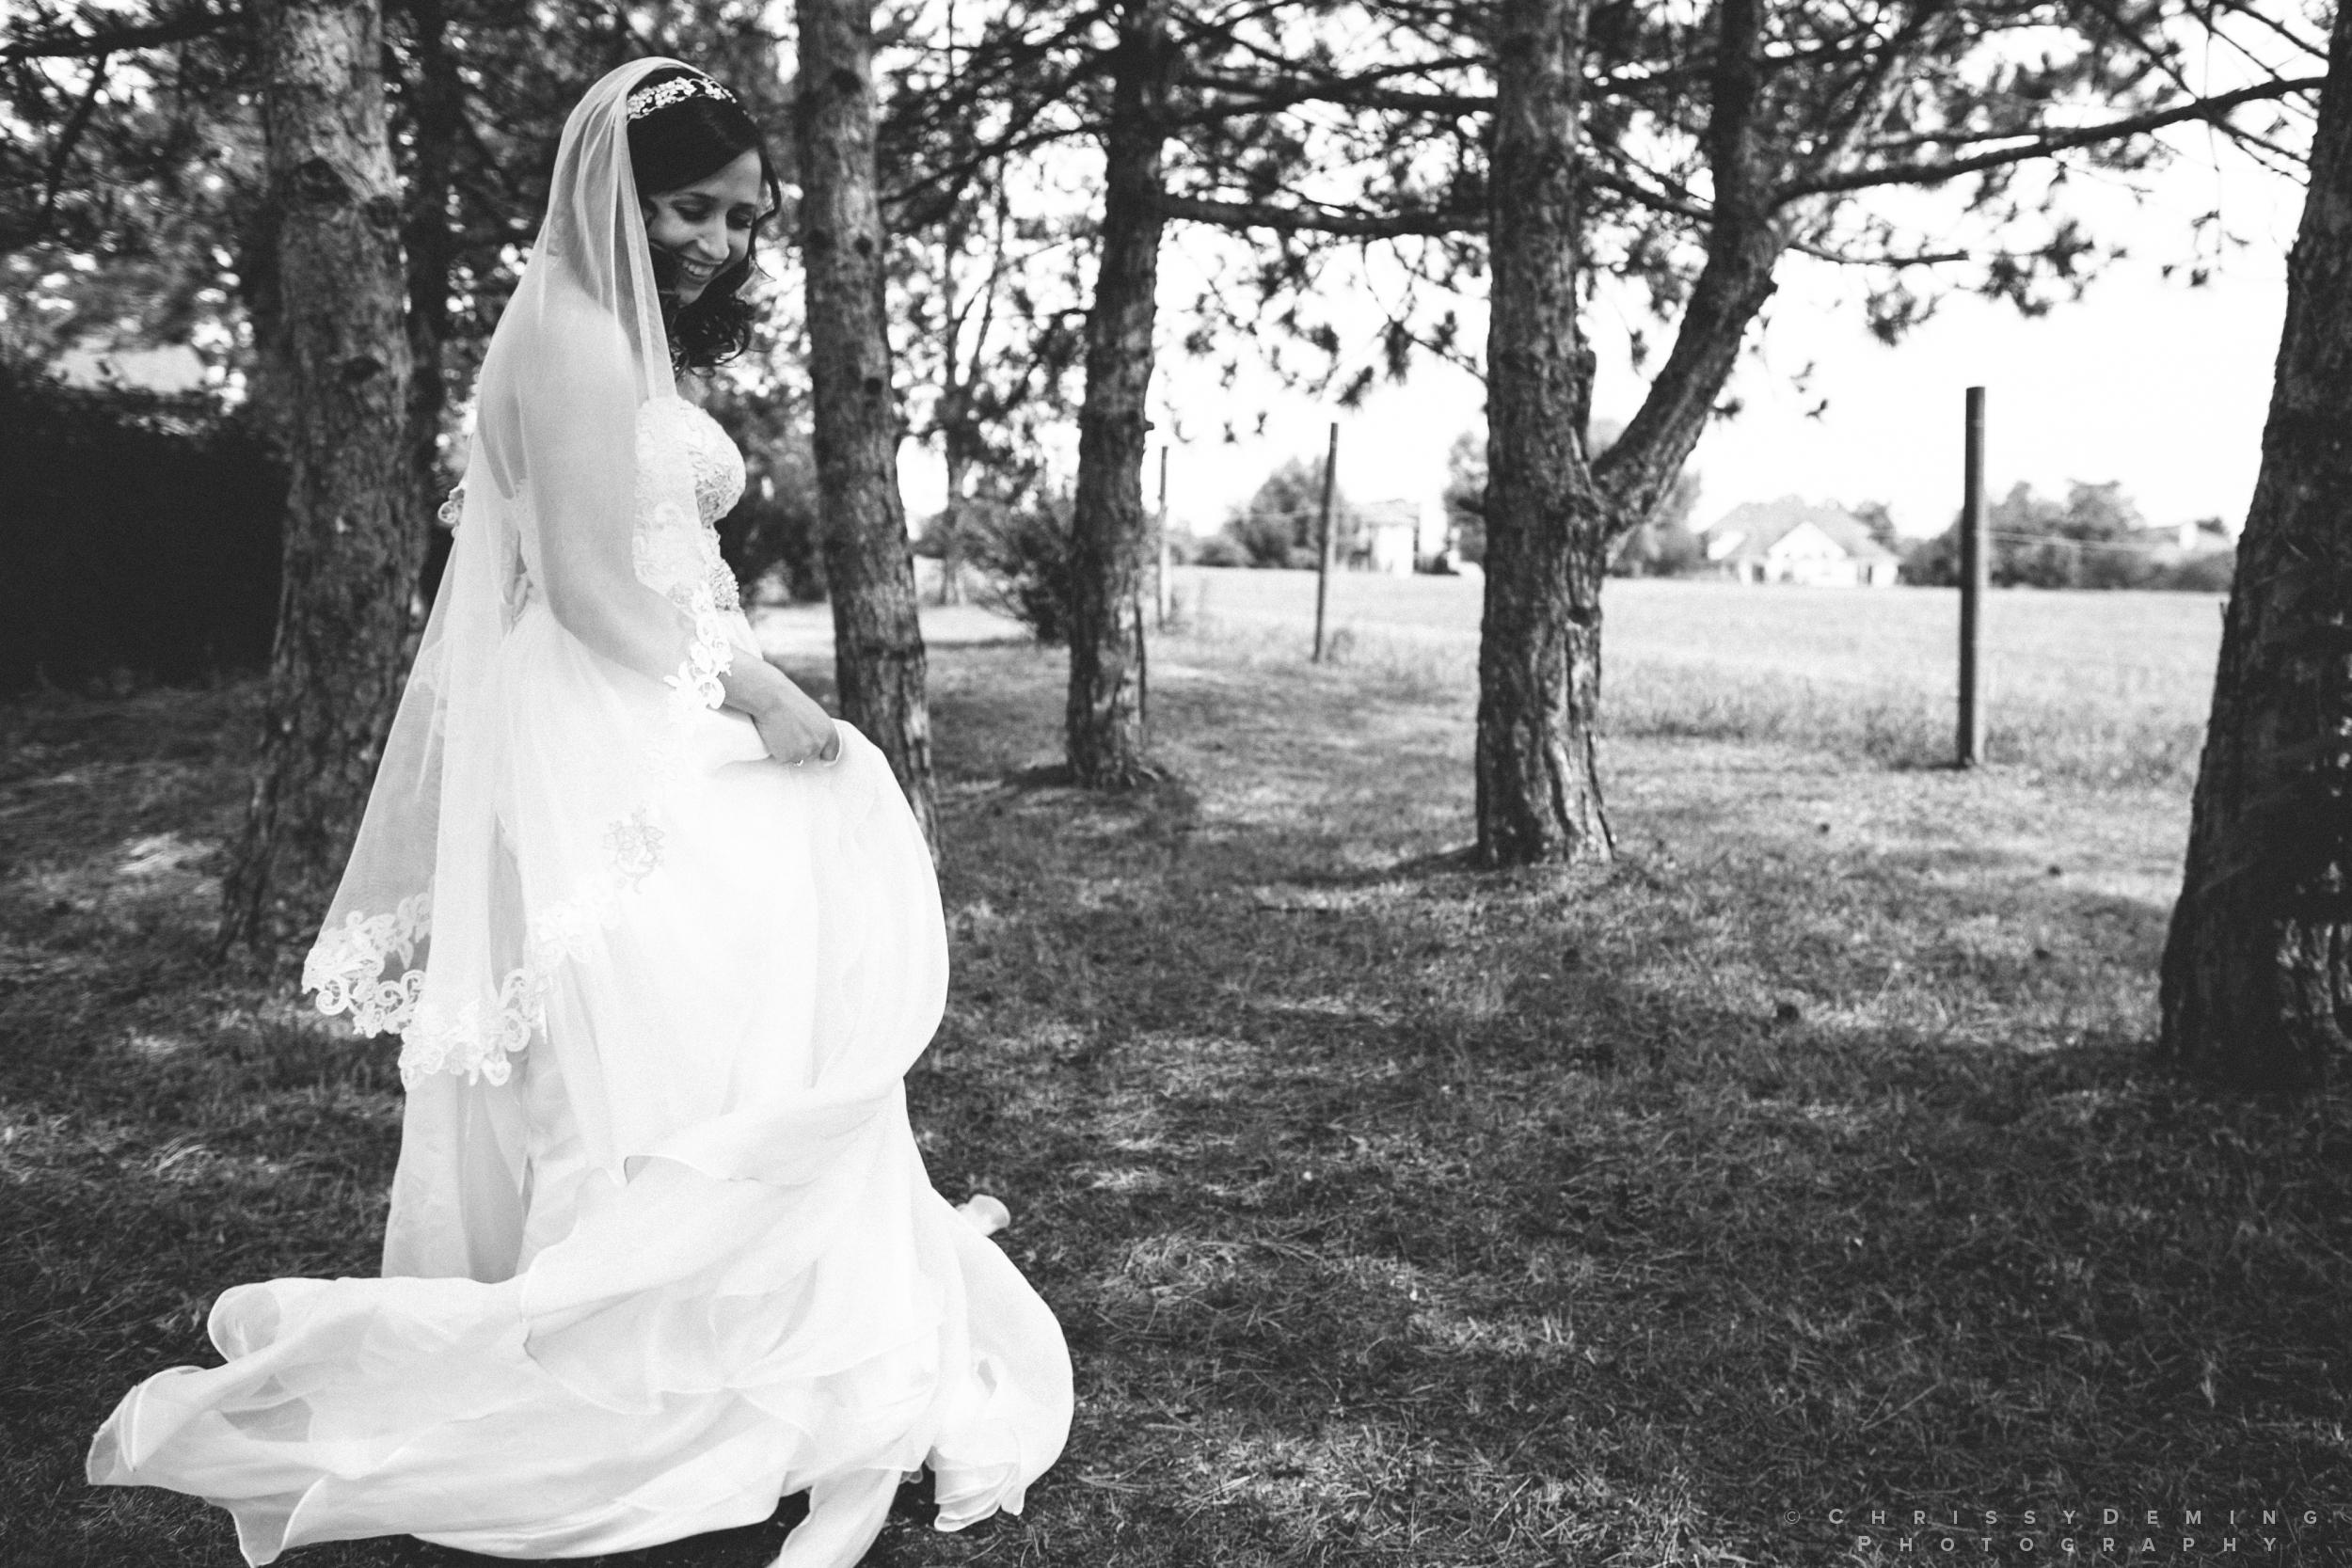 crete_IL_farm_wedding_photographer_0010.jpg